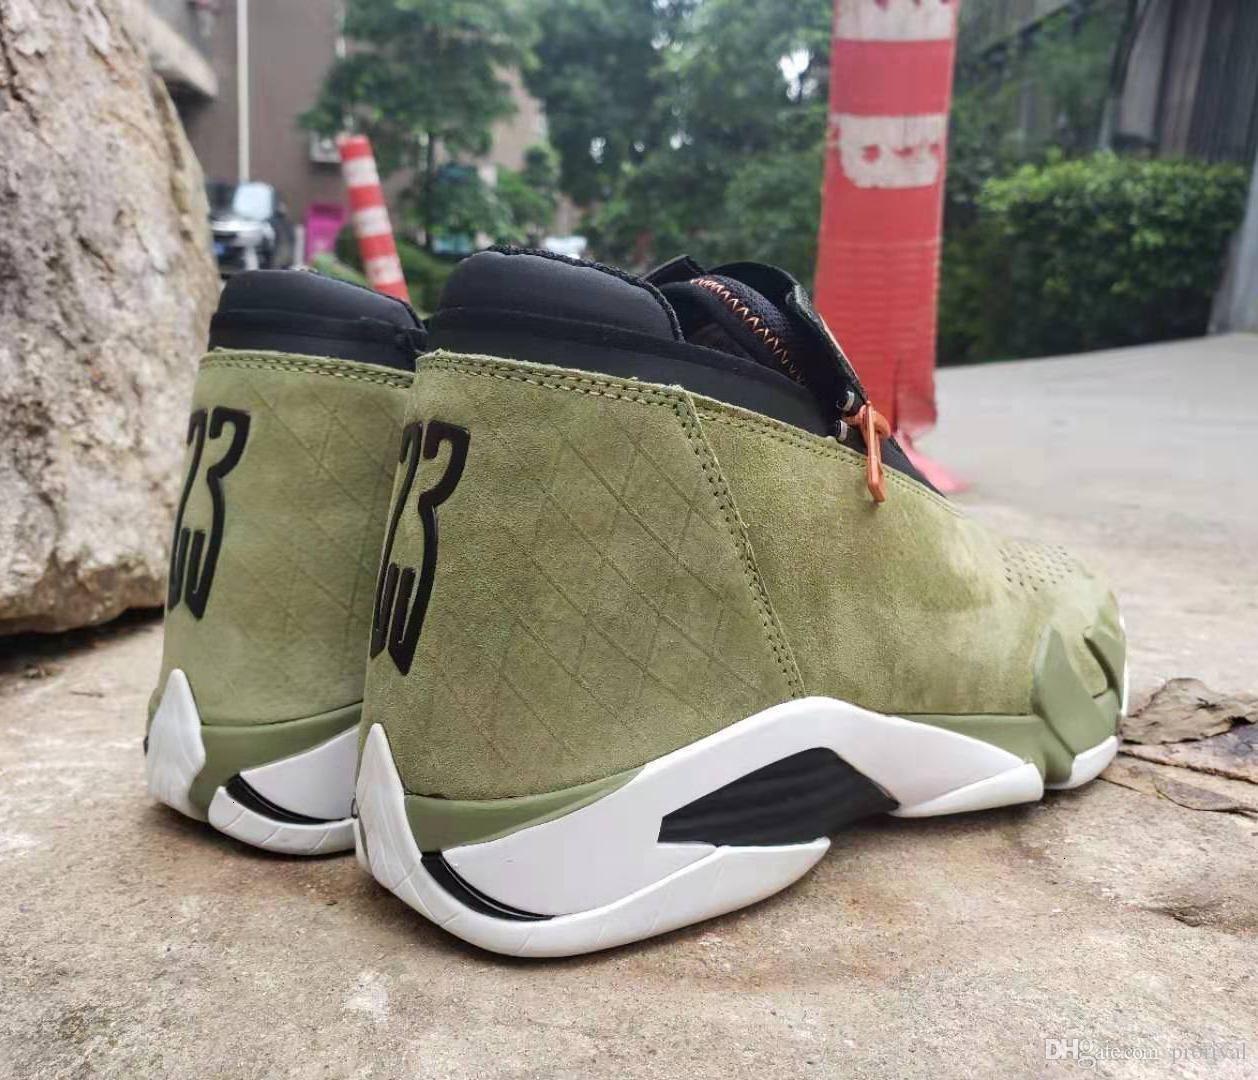 Scarpe Mens Sneakers 14 Basketball Suede Designer Zipper Mesh oliva Last Shot nero rosso Jumpman 14s Xiv Des Hommes Chaussures formatori scarpe